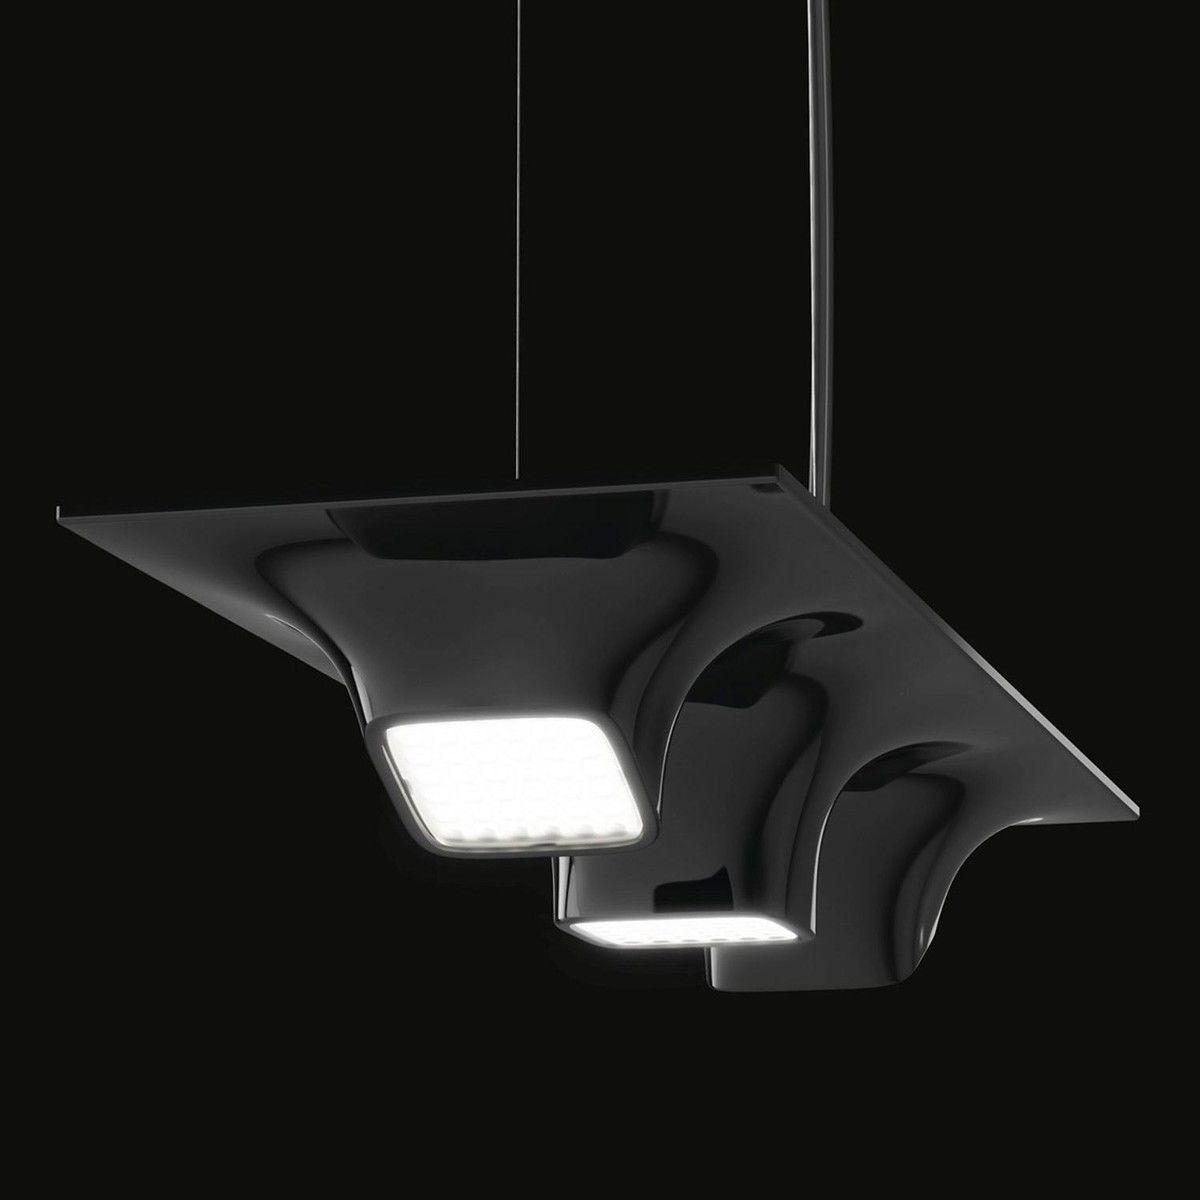 squeeze 3 led suspension lamp nimbus. Black Bedroom Furniture Sets. Home Design Ideas